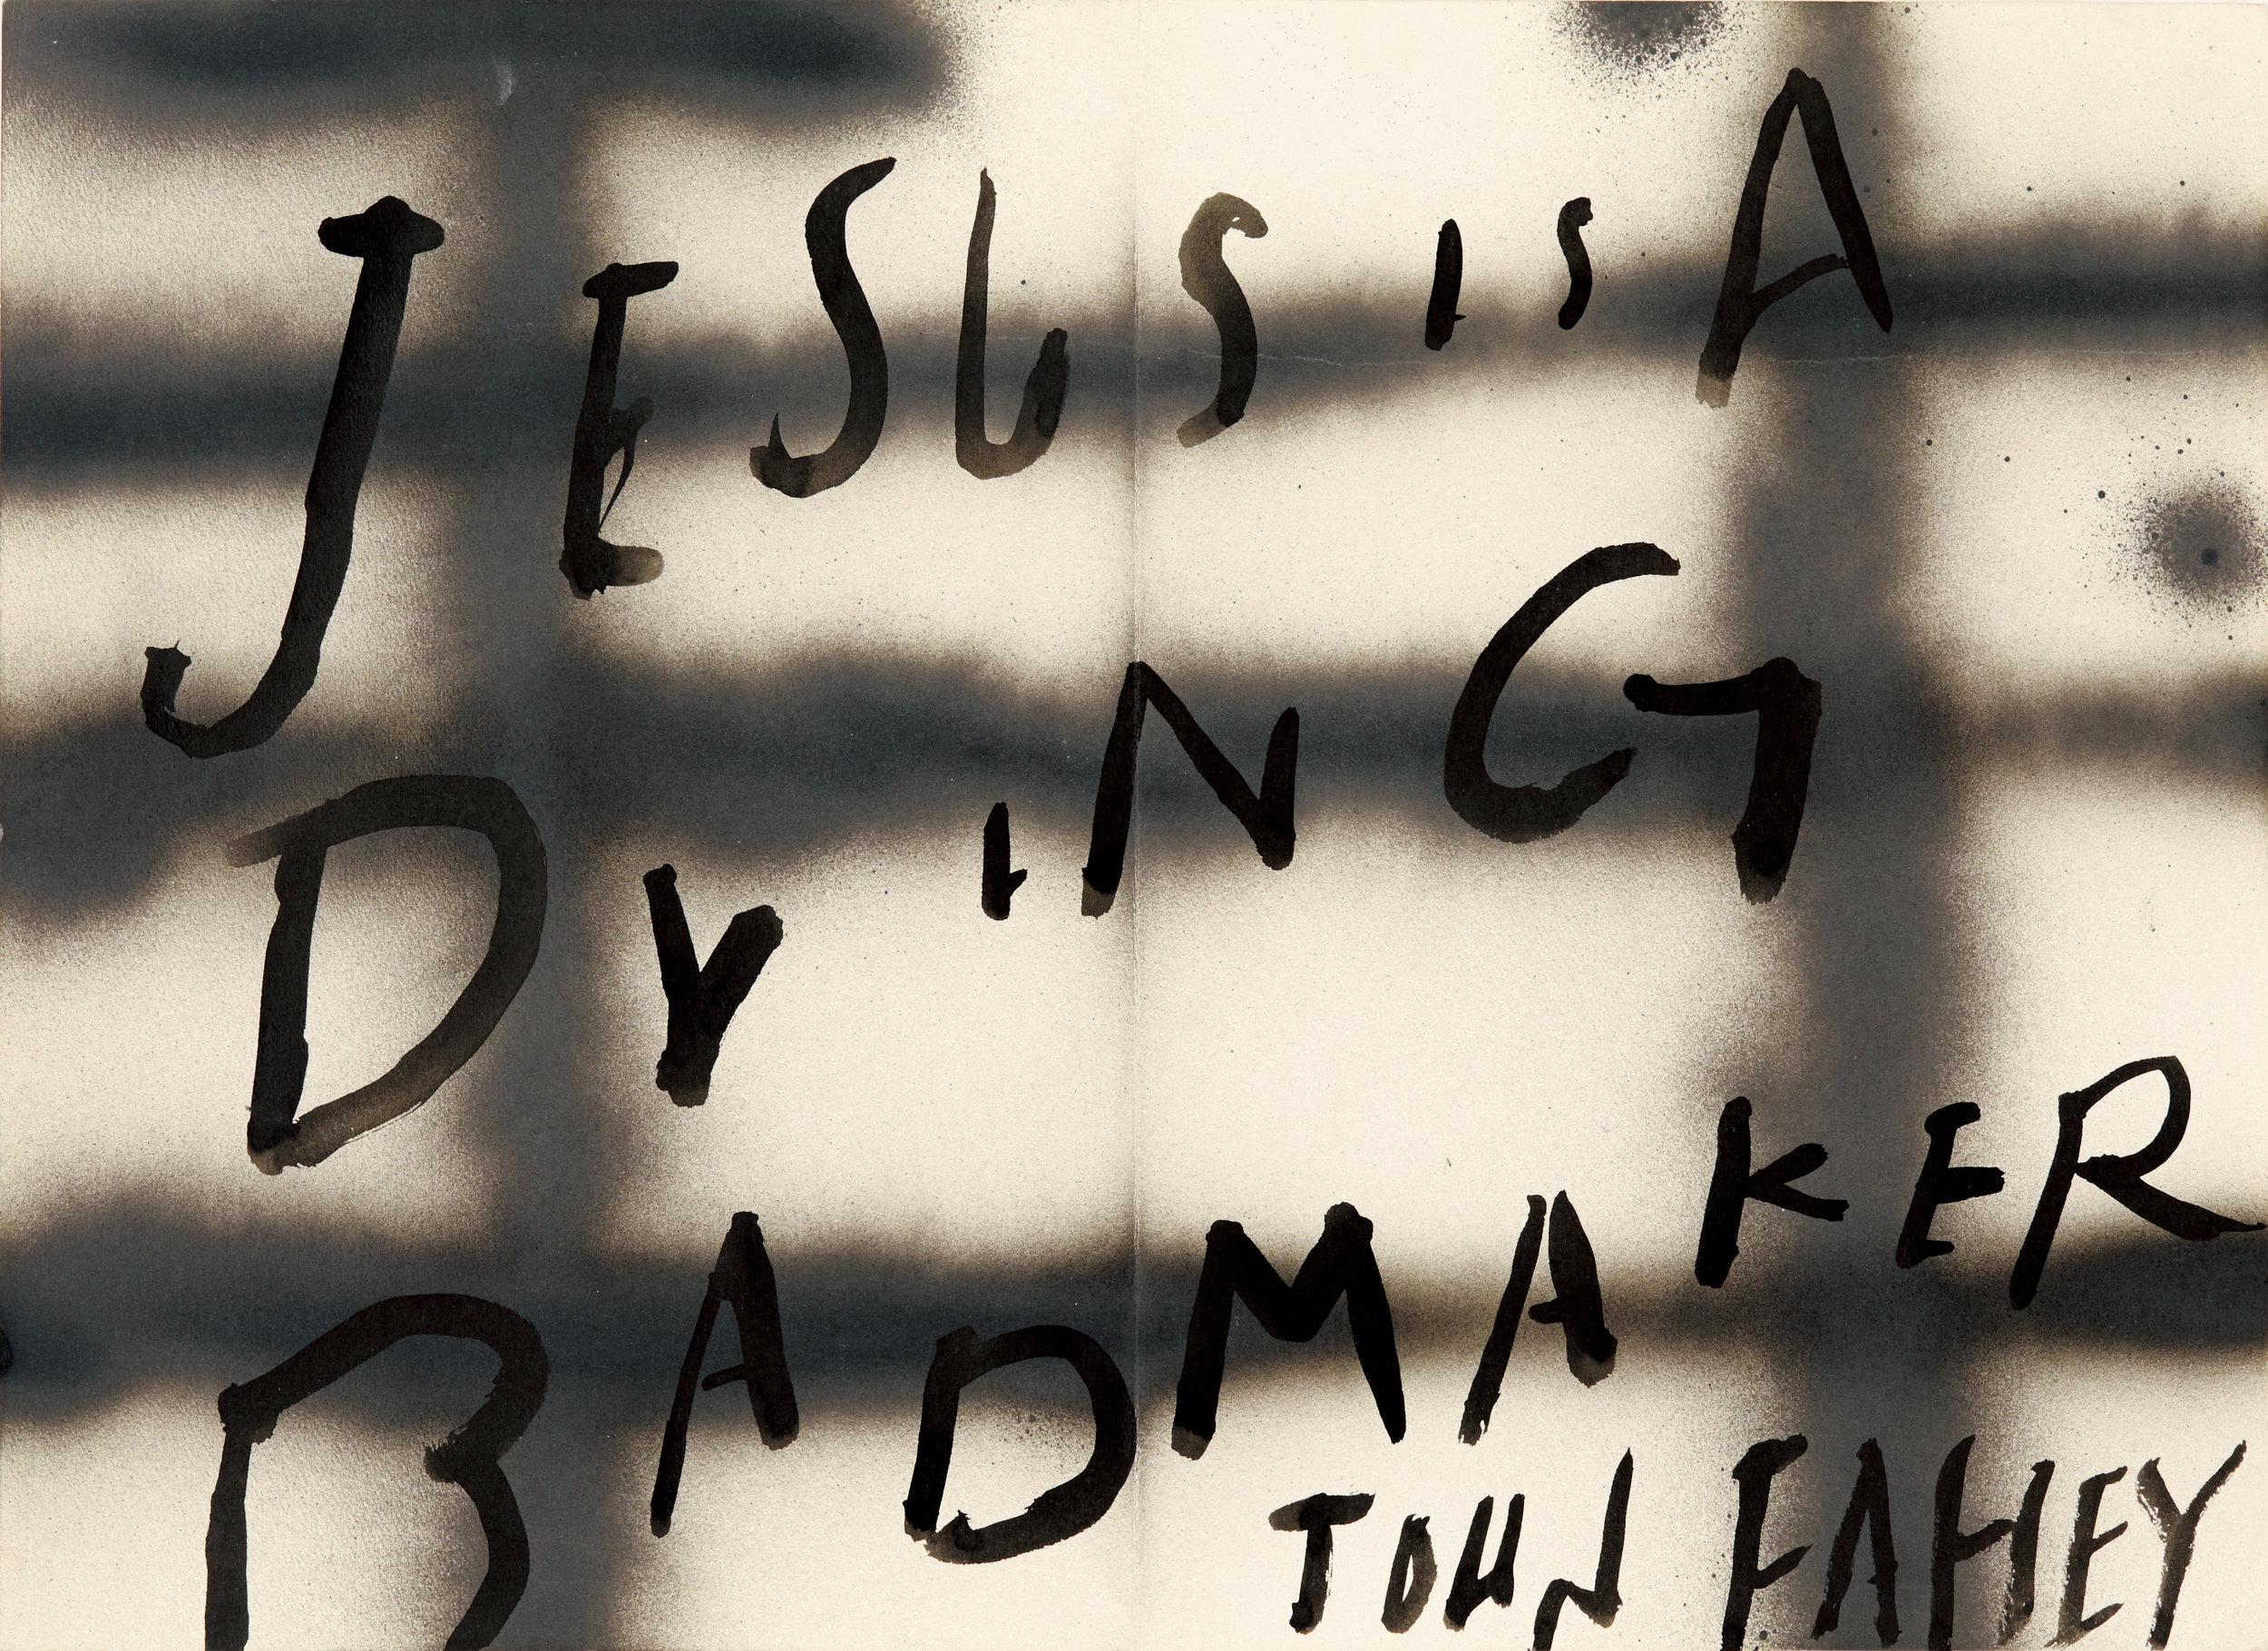 JESUS IS..., 2006 ©︎Jun Tsunoda